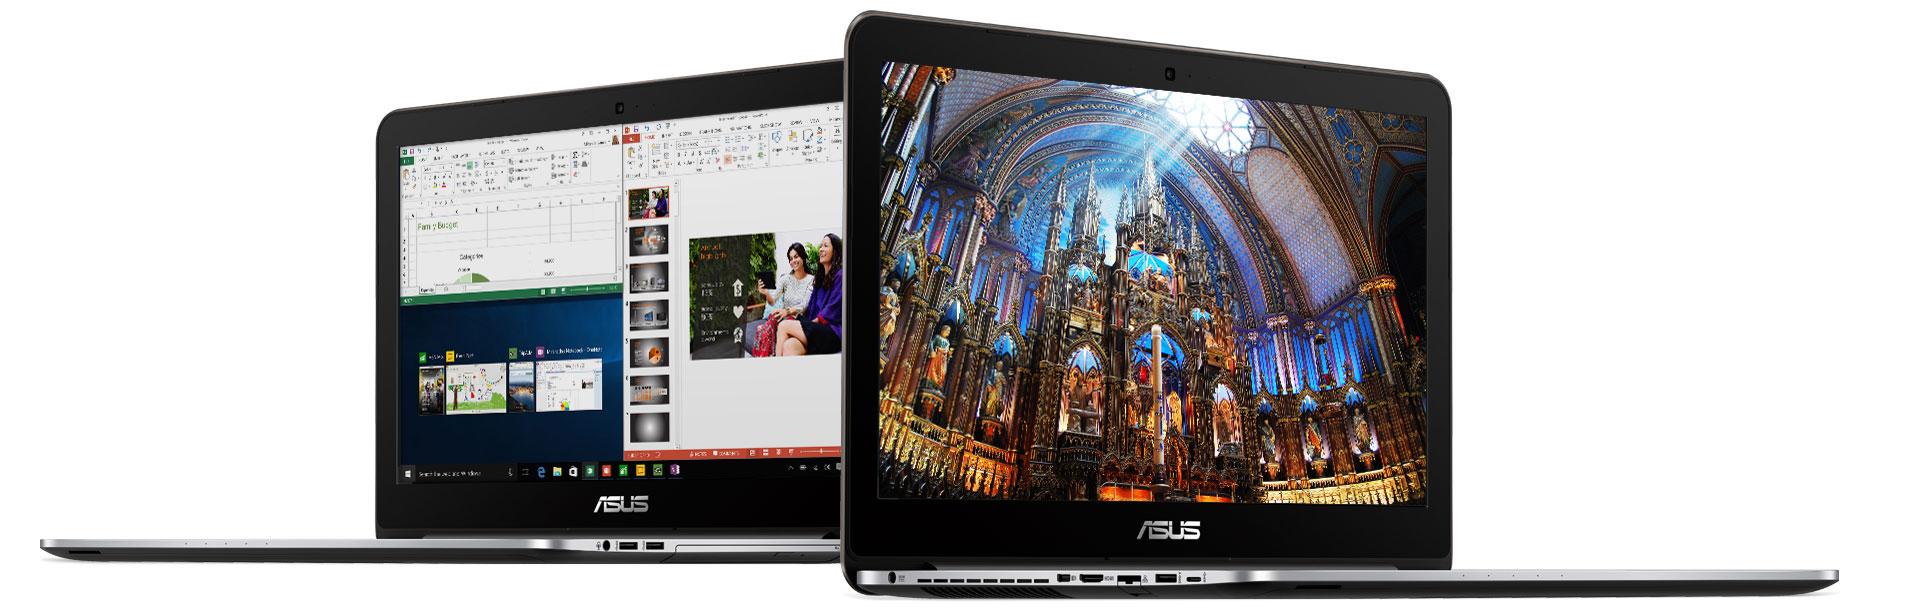 VivoBook Pro N552VX   Laptops   ASUS Global